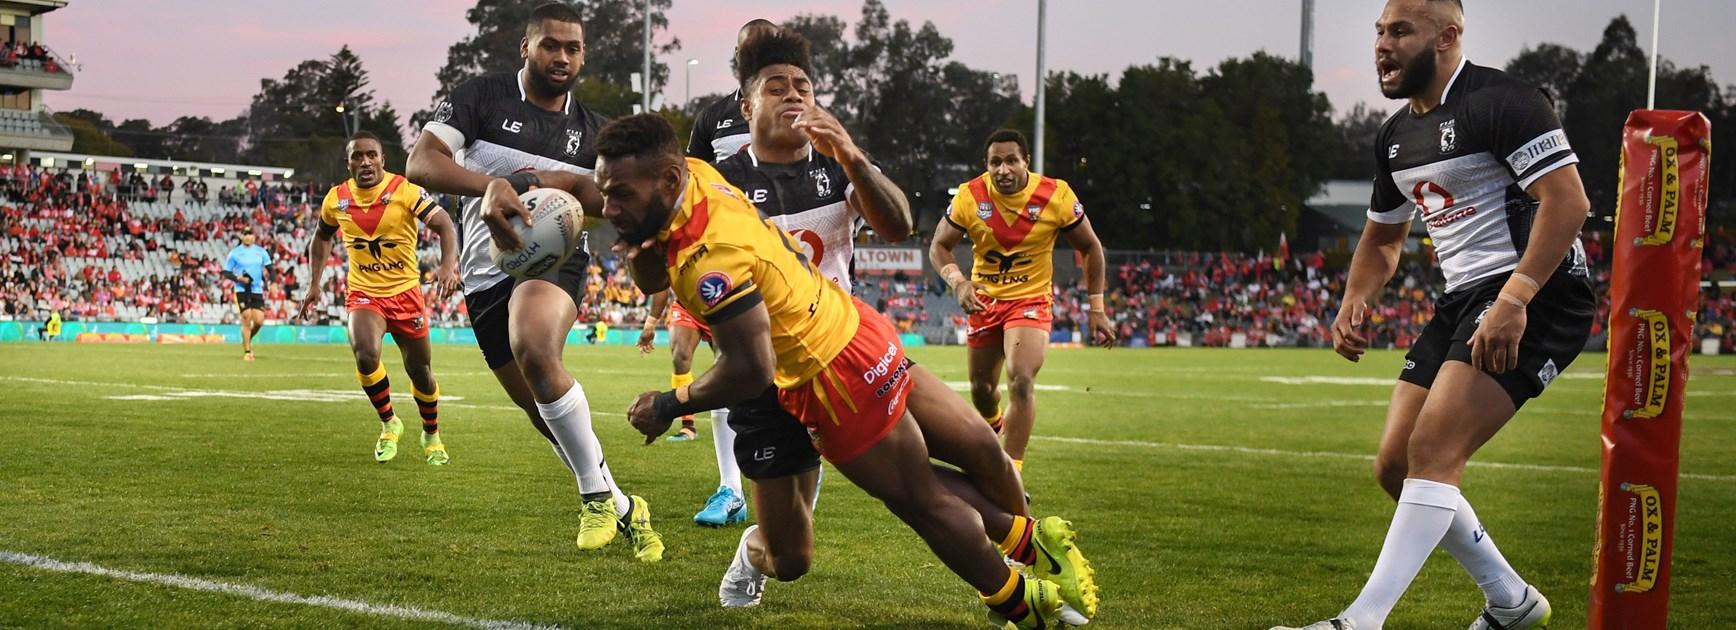 Papua New Guinea starts fast to stun Fiji in Pacific Test